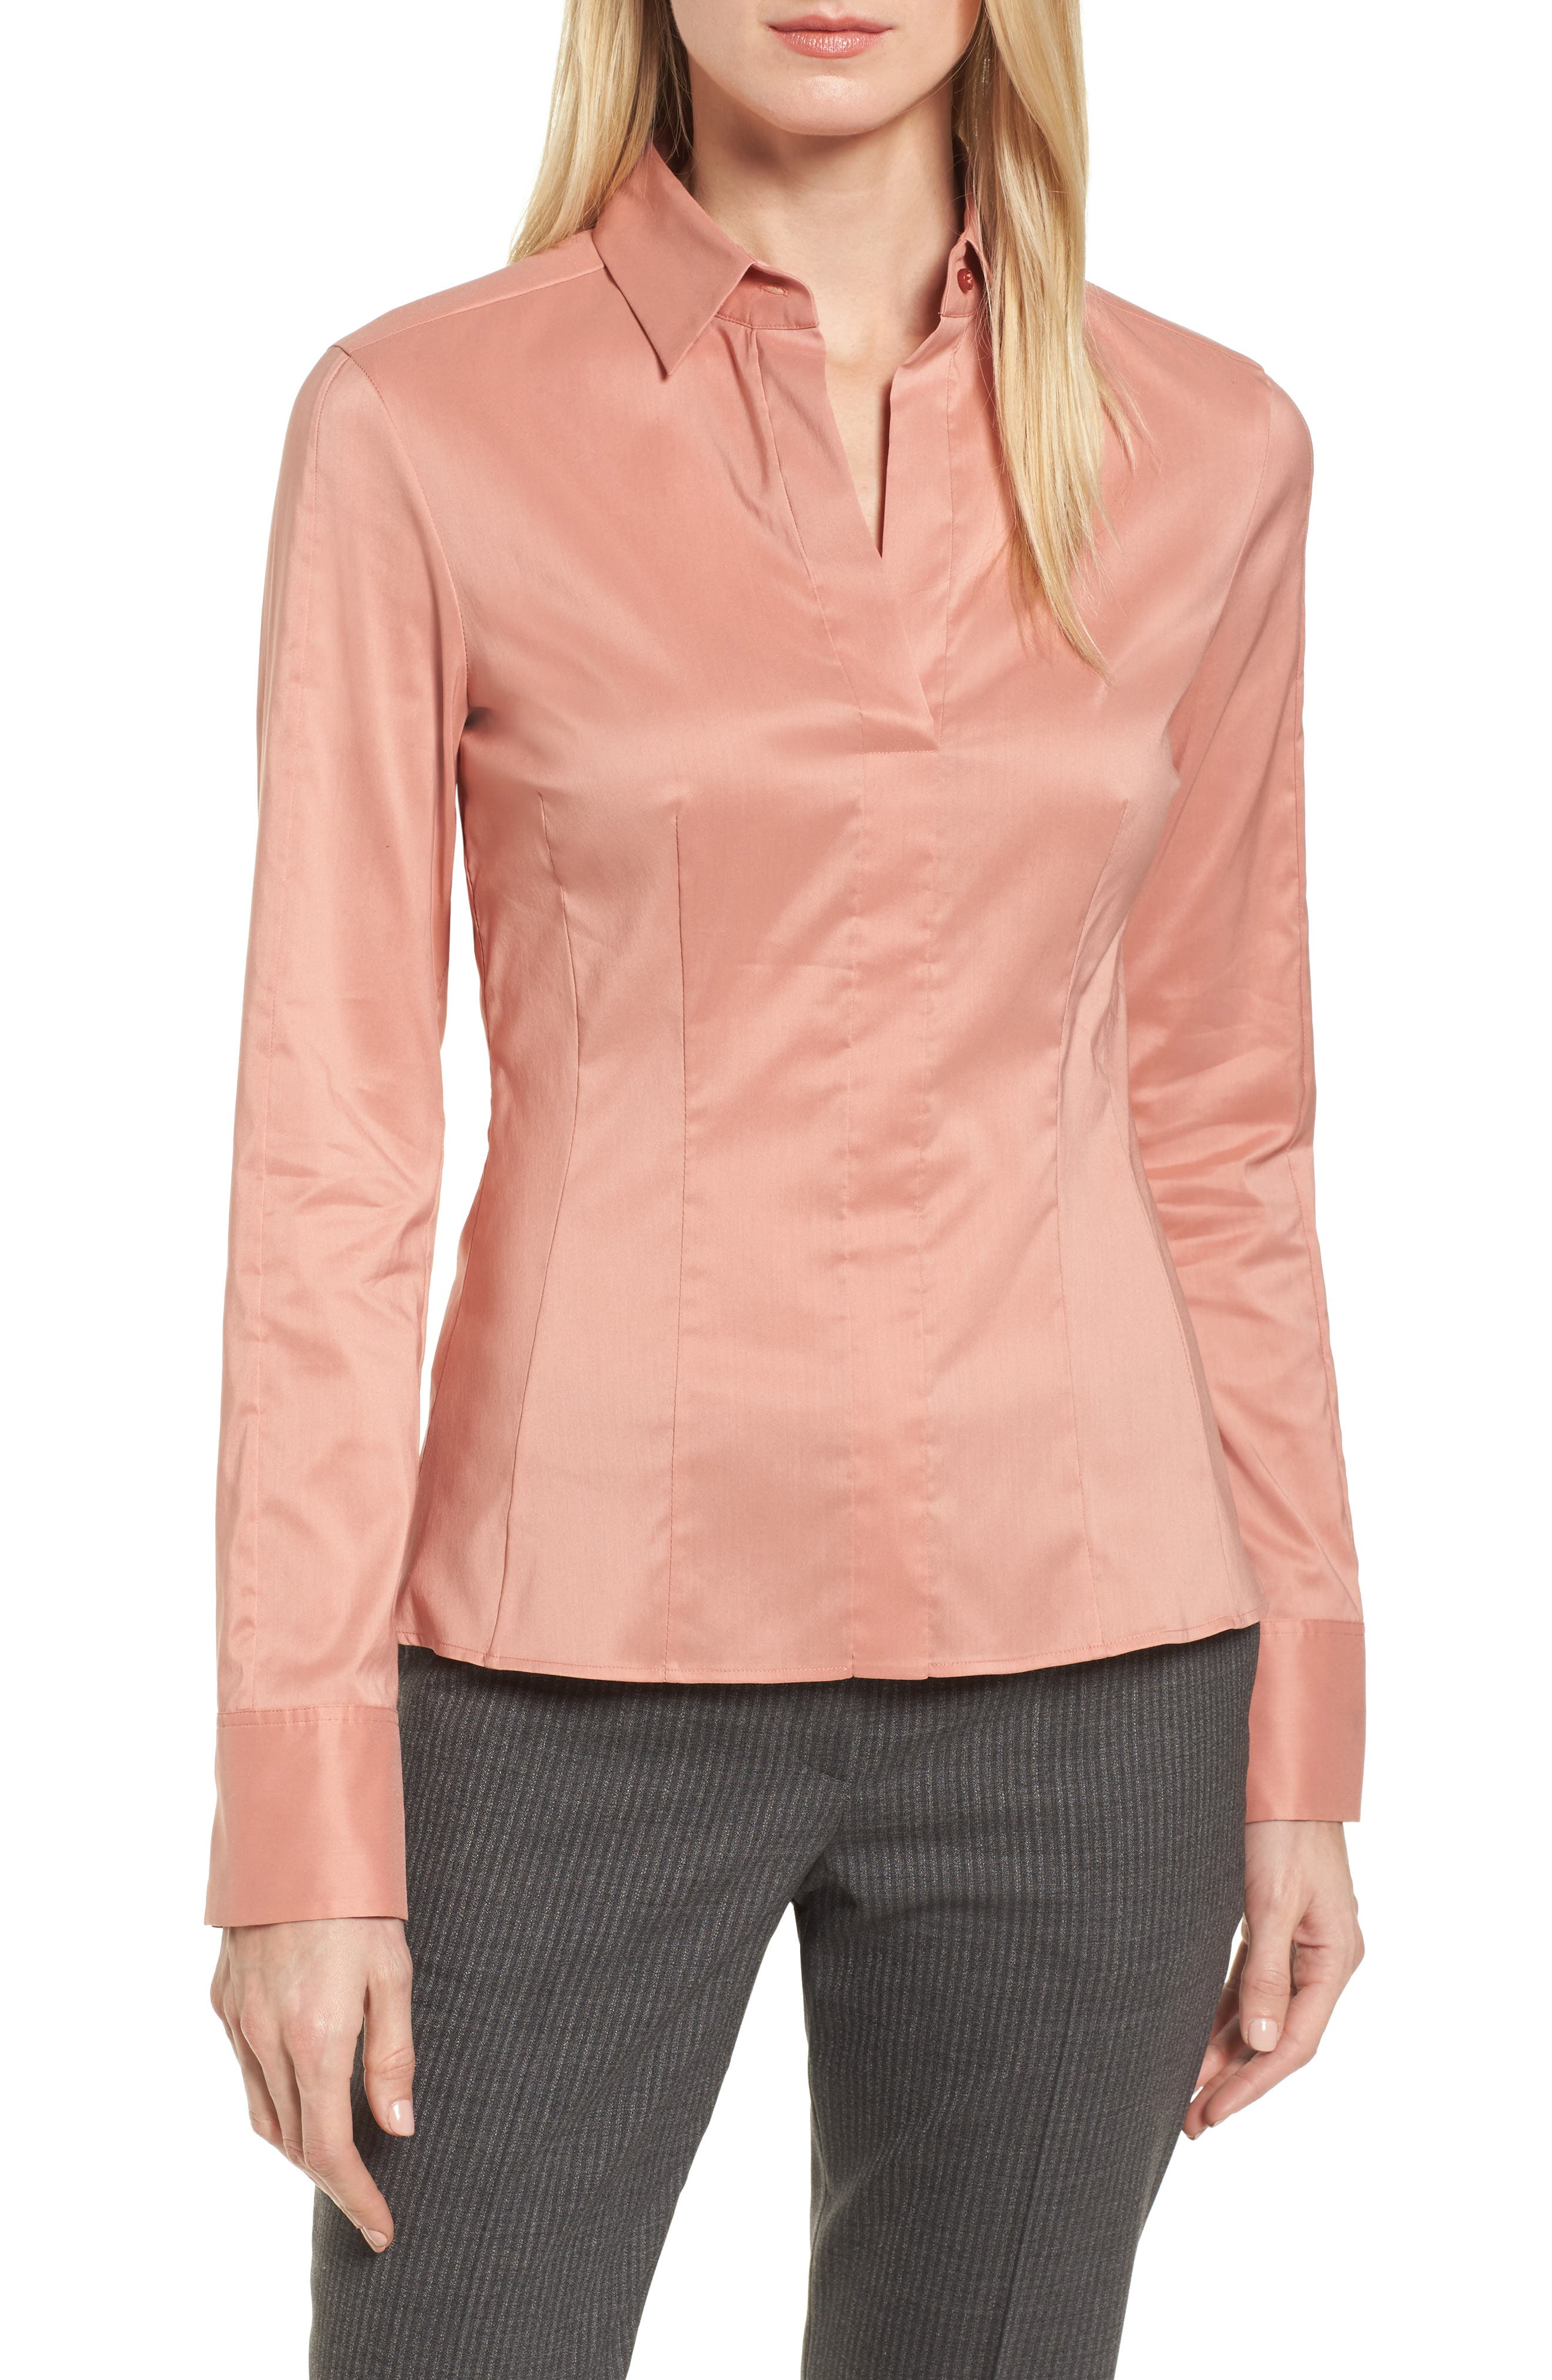 Bashina Fitted Stretch Poplin Shirt,                         Main,                         color, Sand Rose